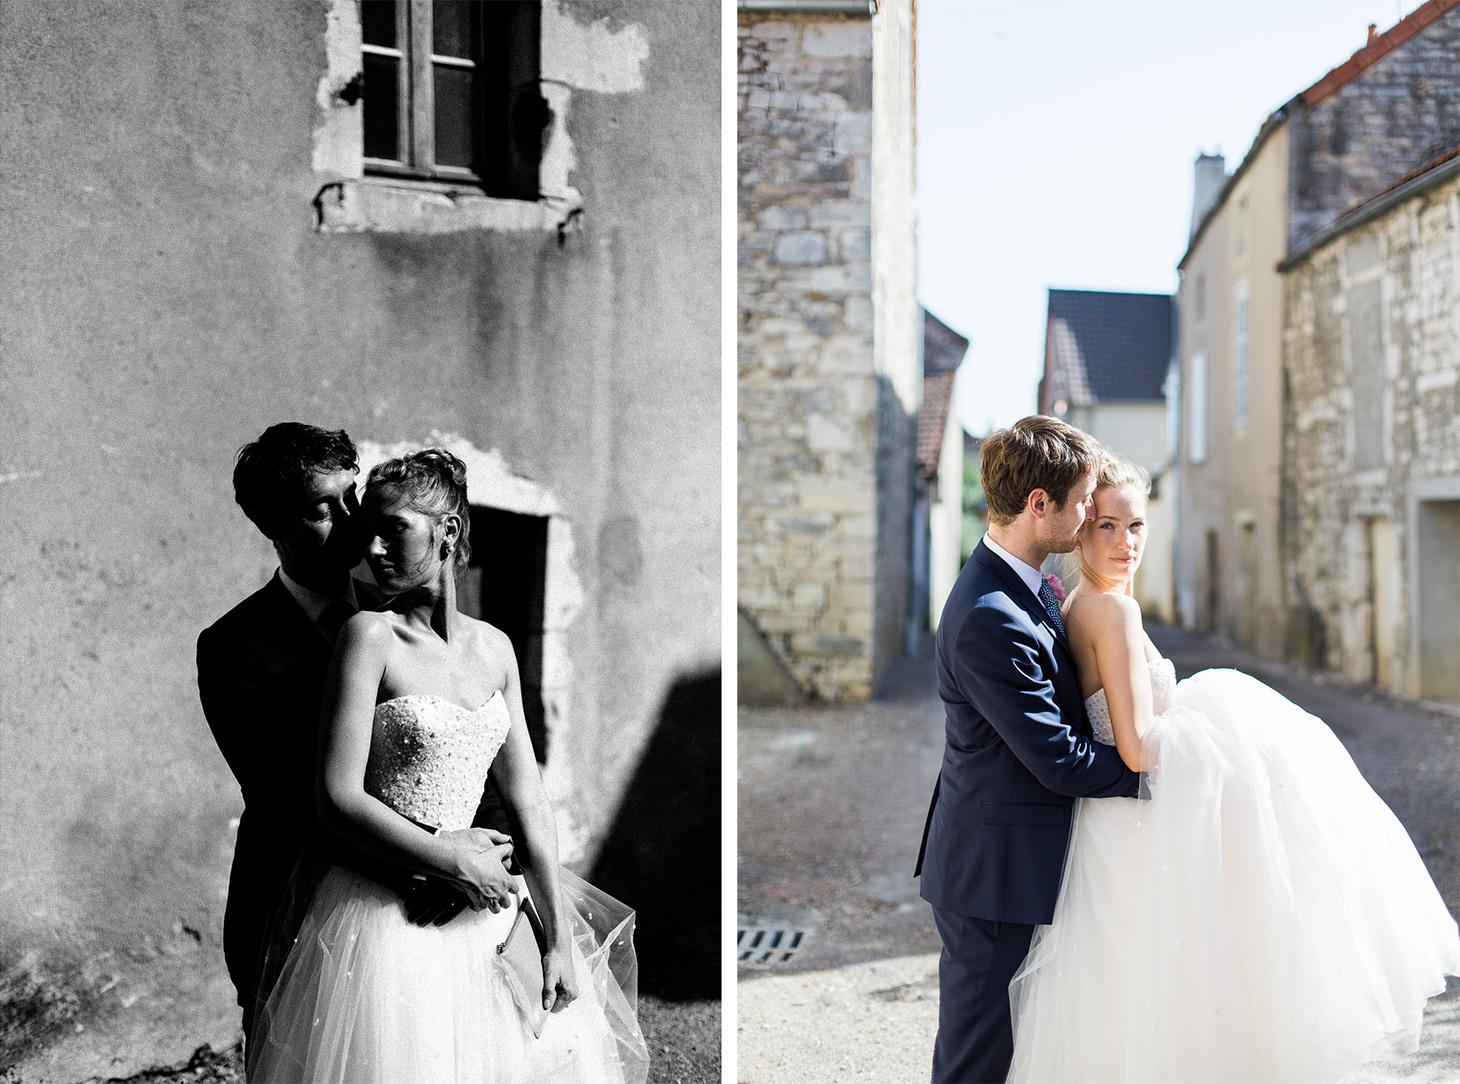 bourgogne_wedding_photographer_chateau_pommard-046 copie